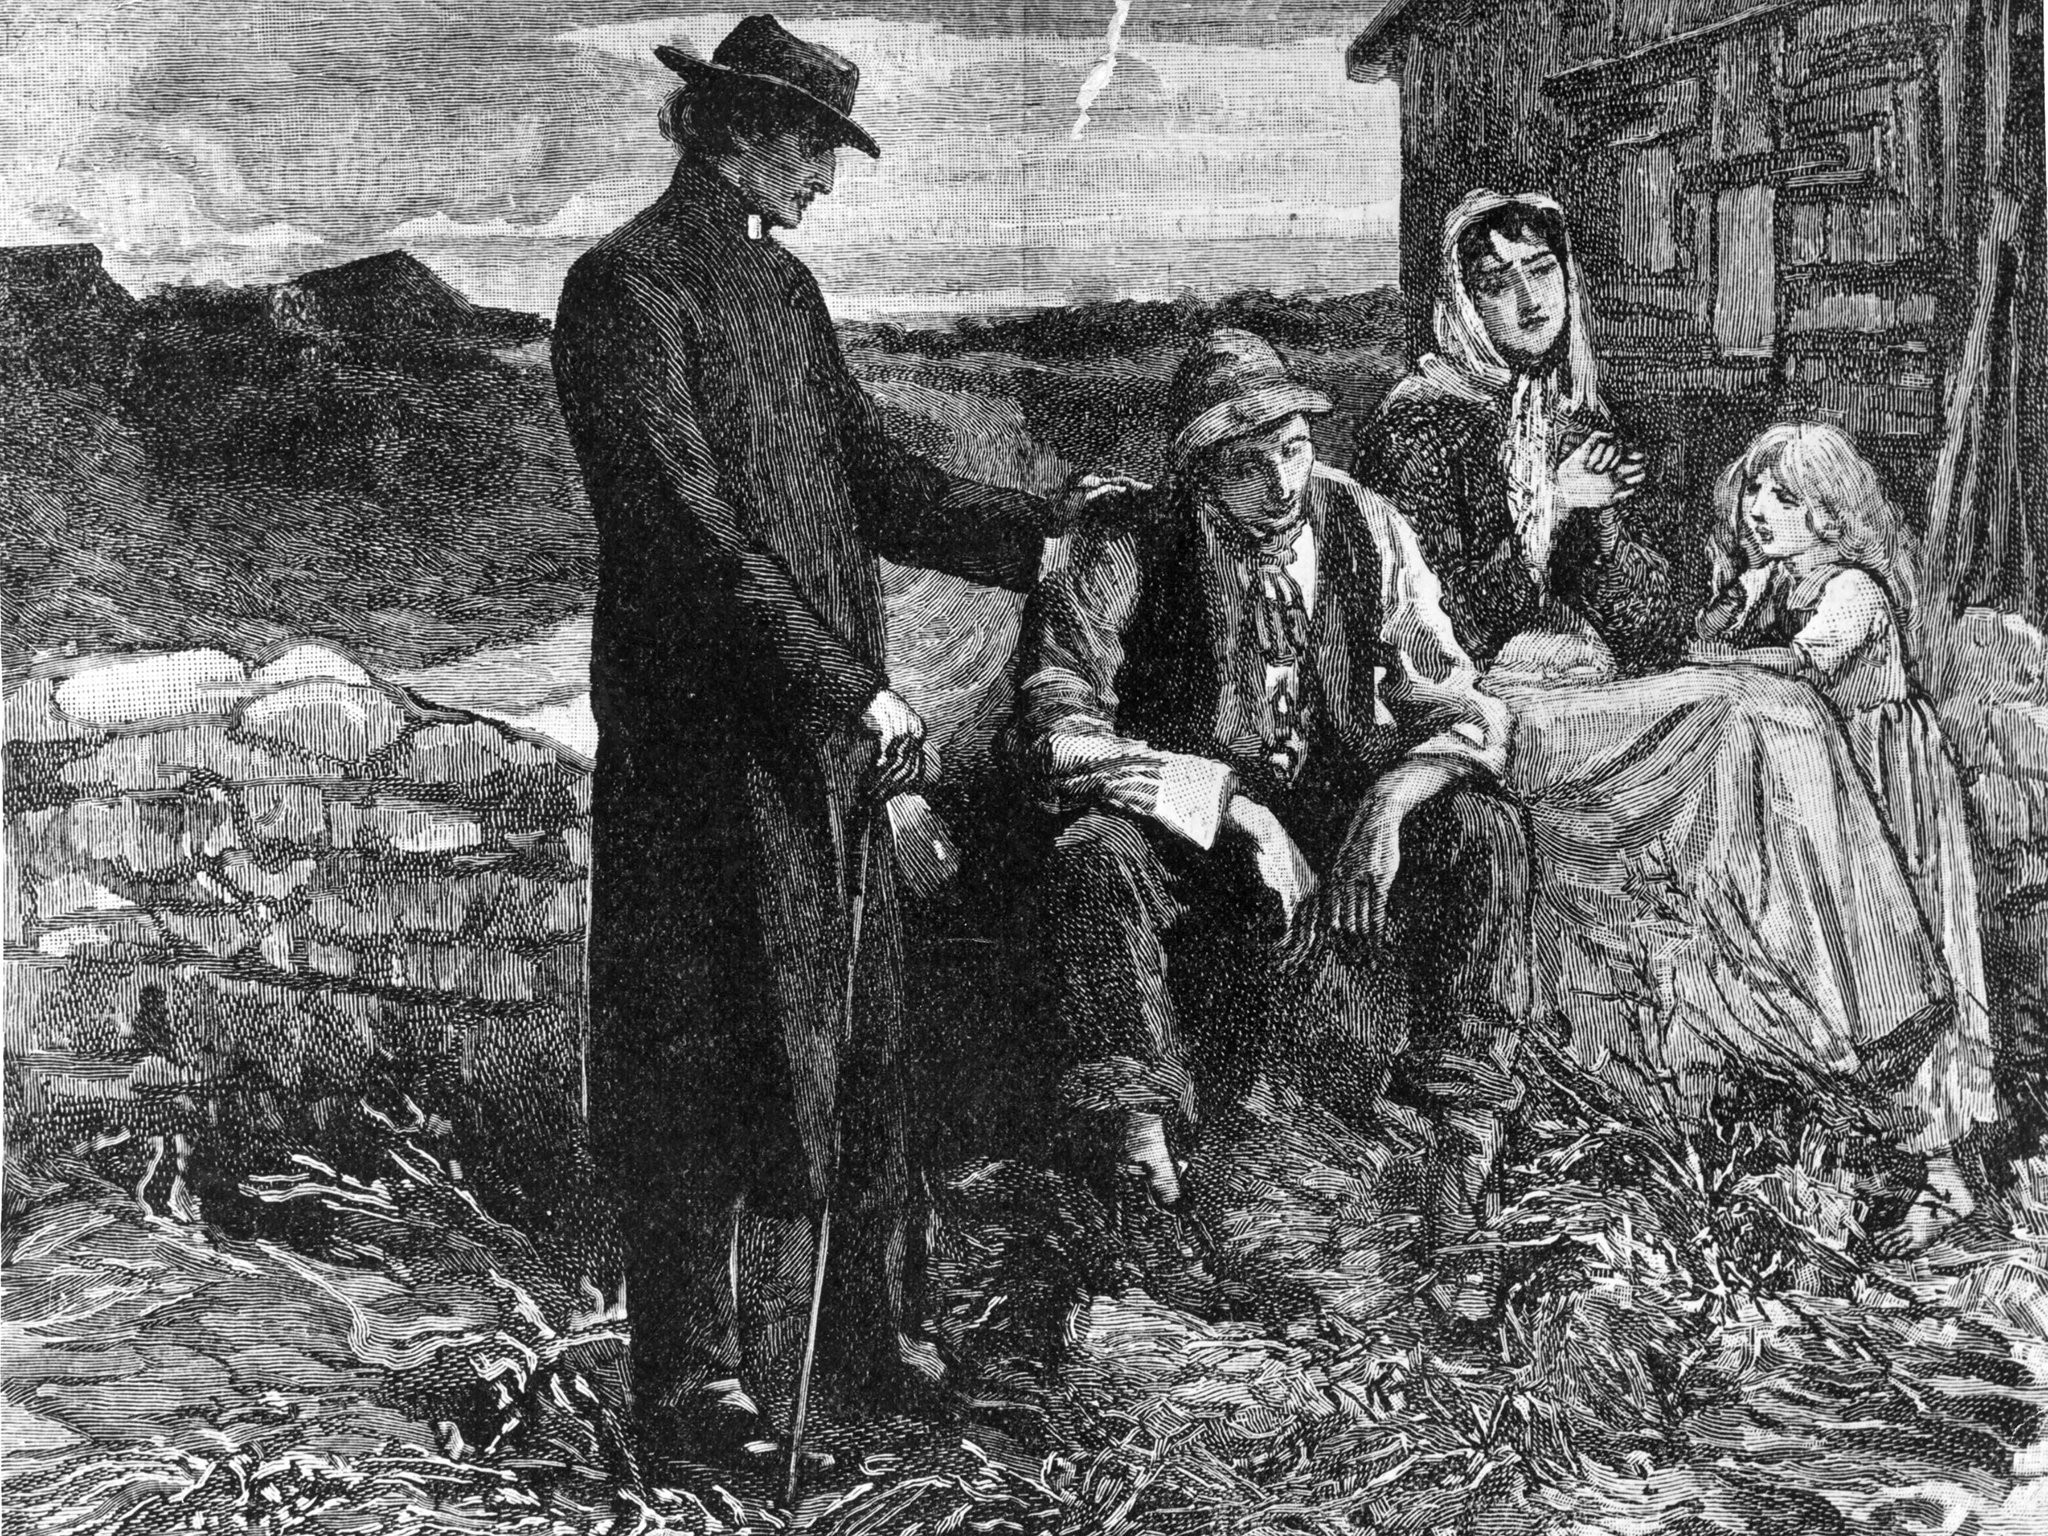 When Was The Potato Famine  Potato famine edy prompts Irish outrage at Channel 4